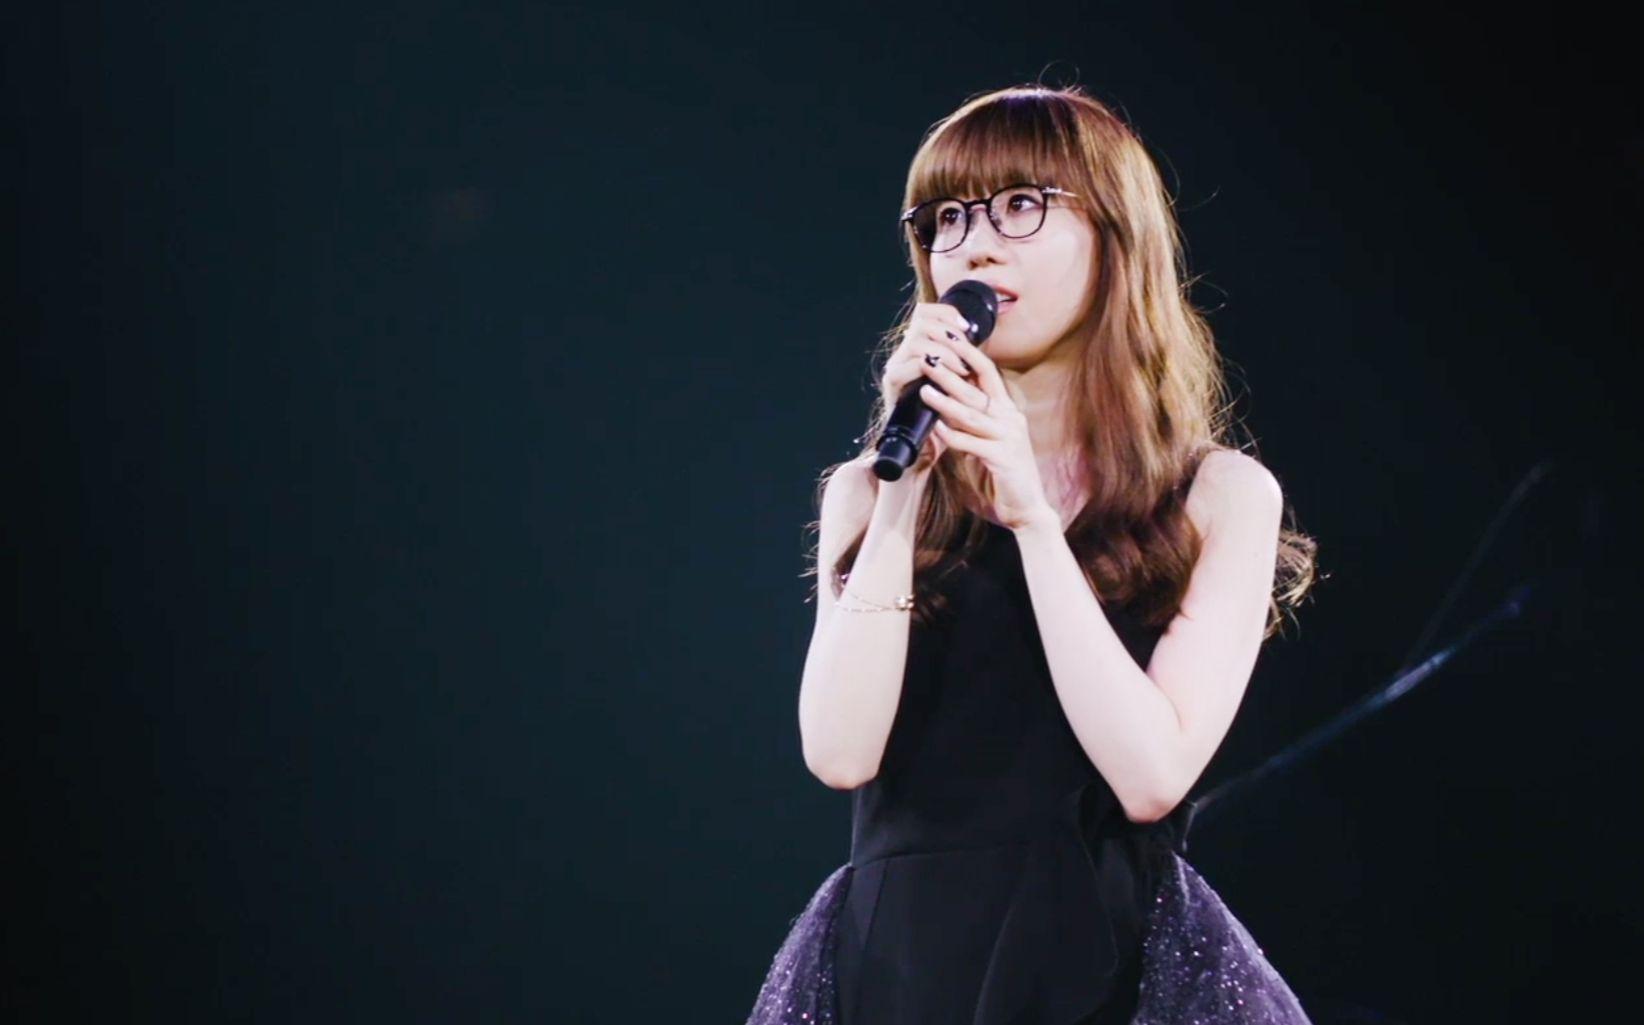 【aimer】aimer Live In Budokan Quot Blanc Et Noir Quot 【中日双语字幕】 三次元音乐 音乐 Bilibili 哔哩哔哩